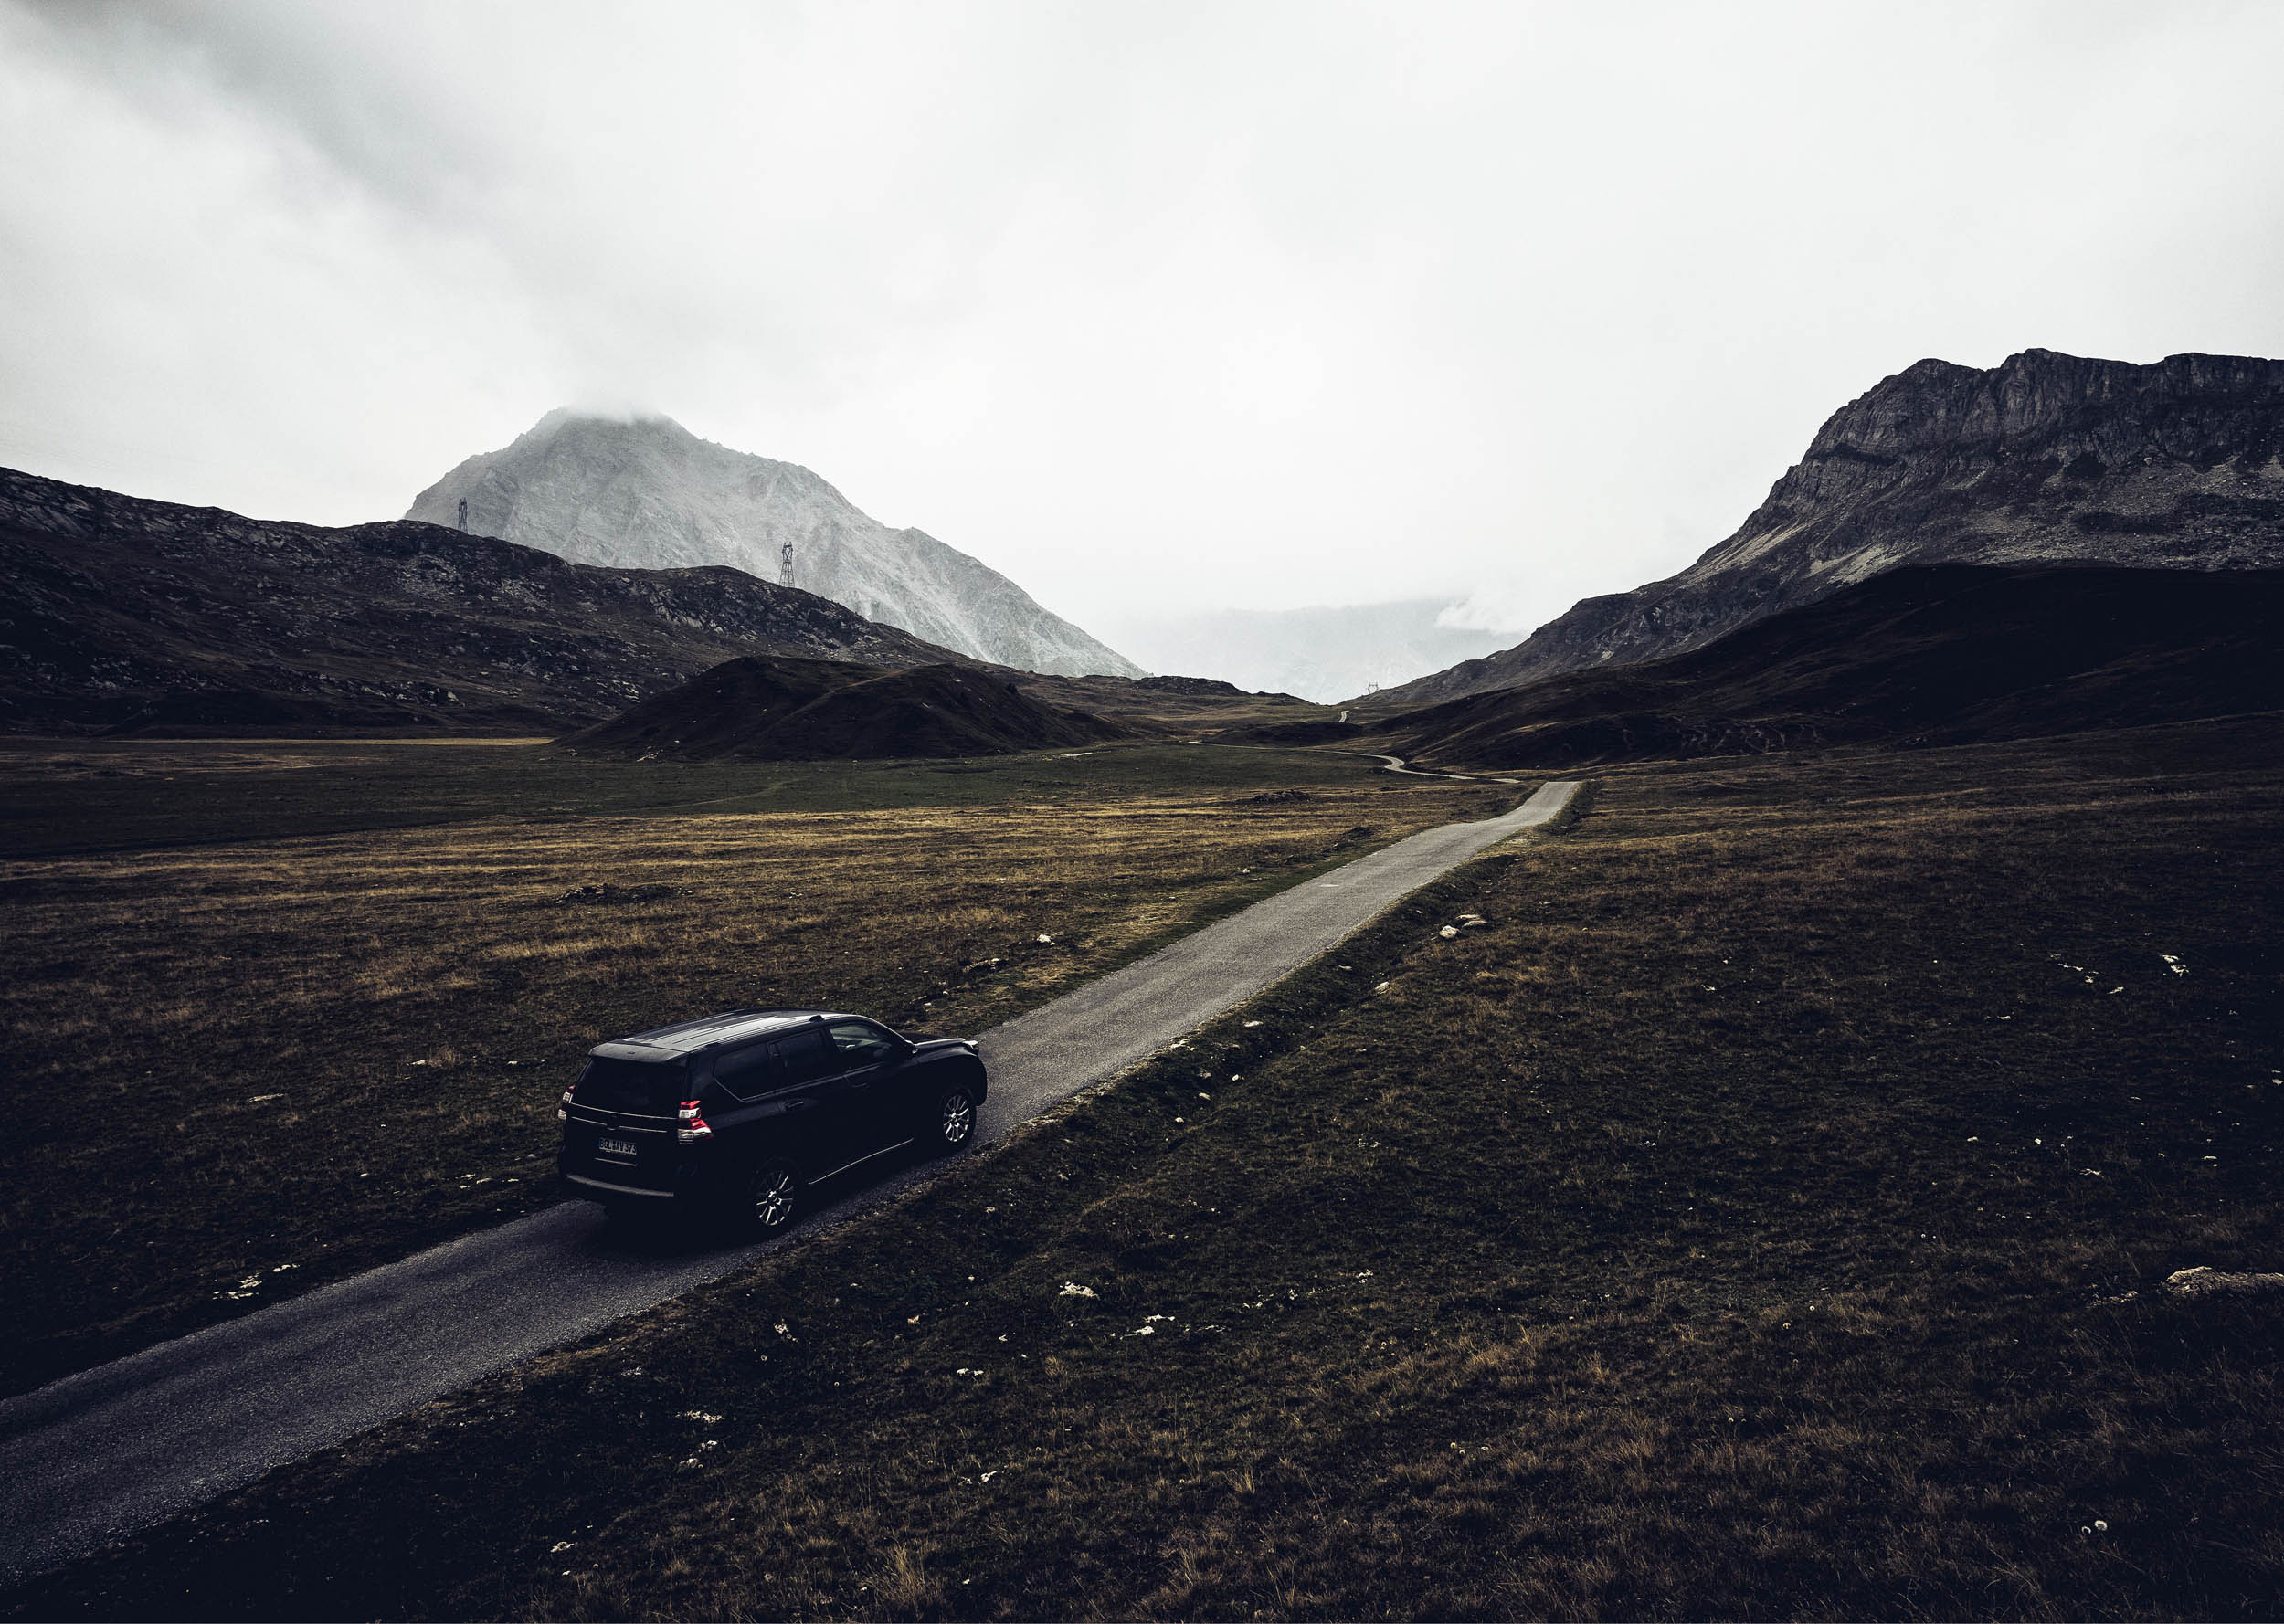 Landcruiser Adventure